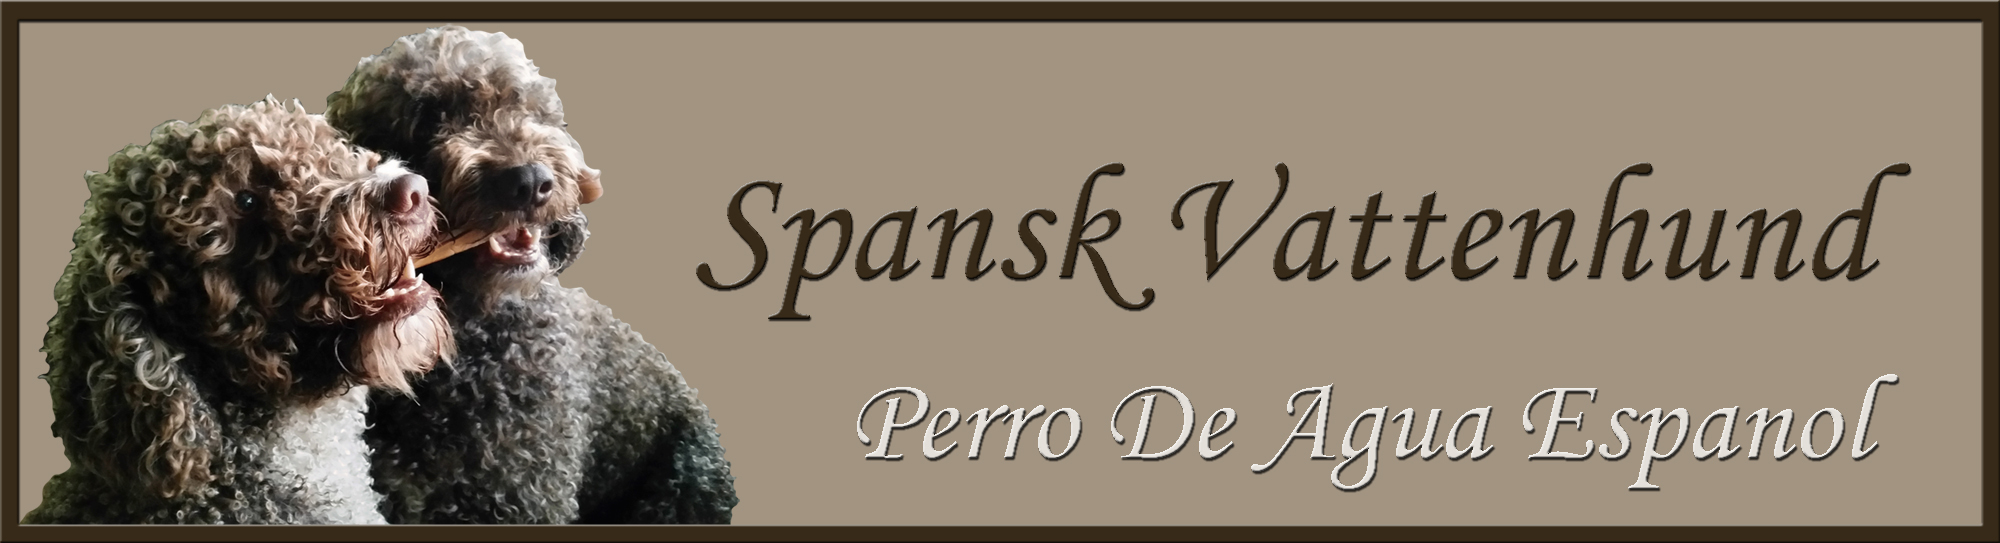 Spansk vattenhund. Perro De Agua Espanol